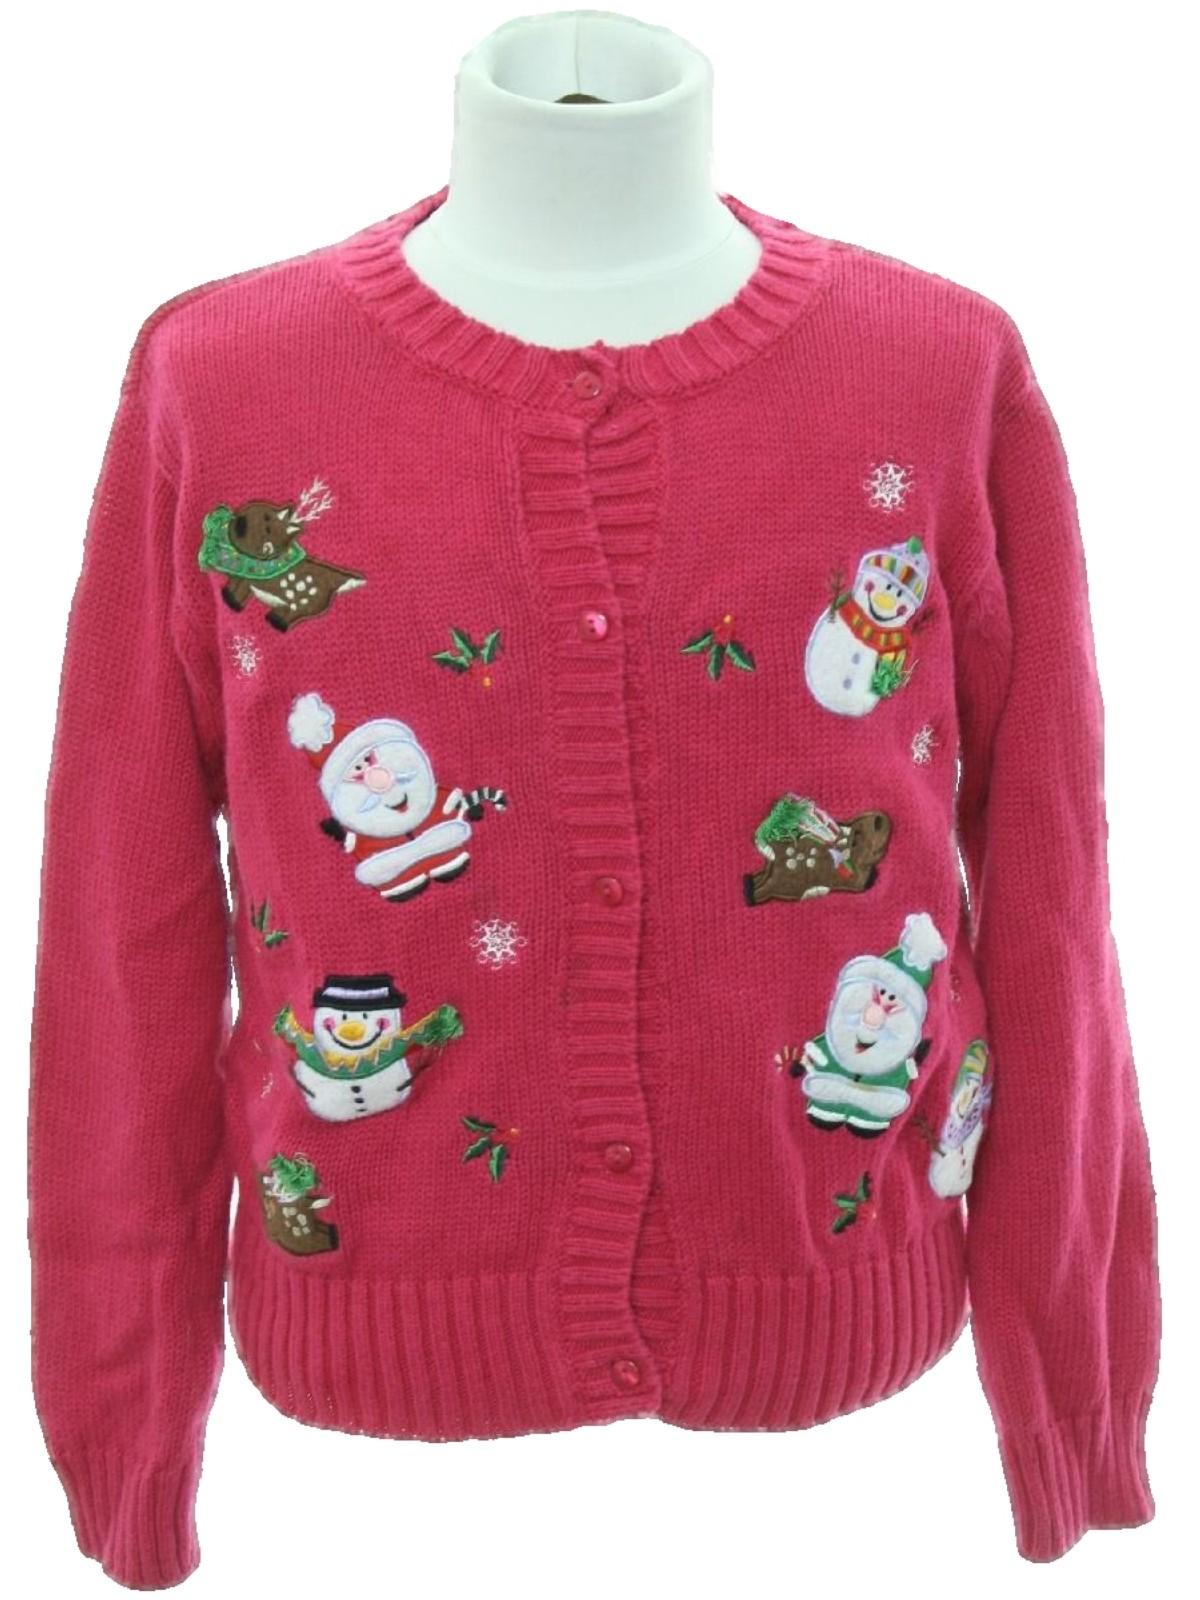 305932jpg - Pink Ugly Christmas Sweater